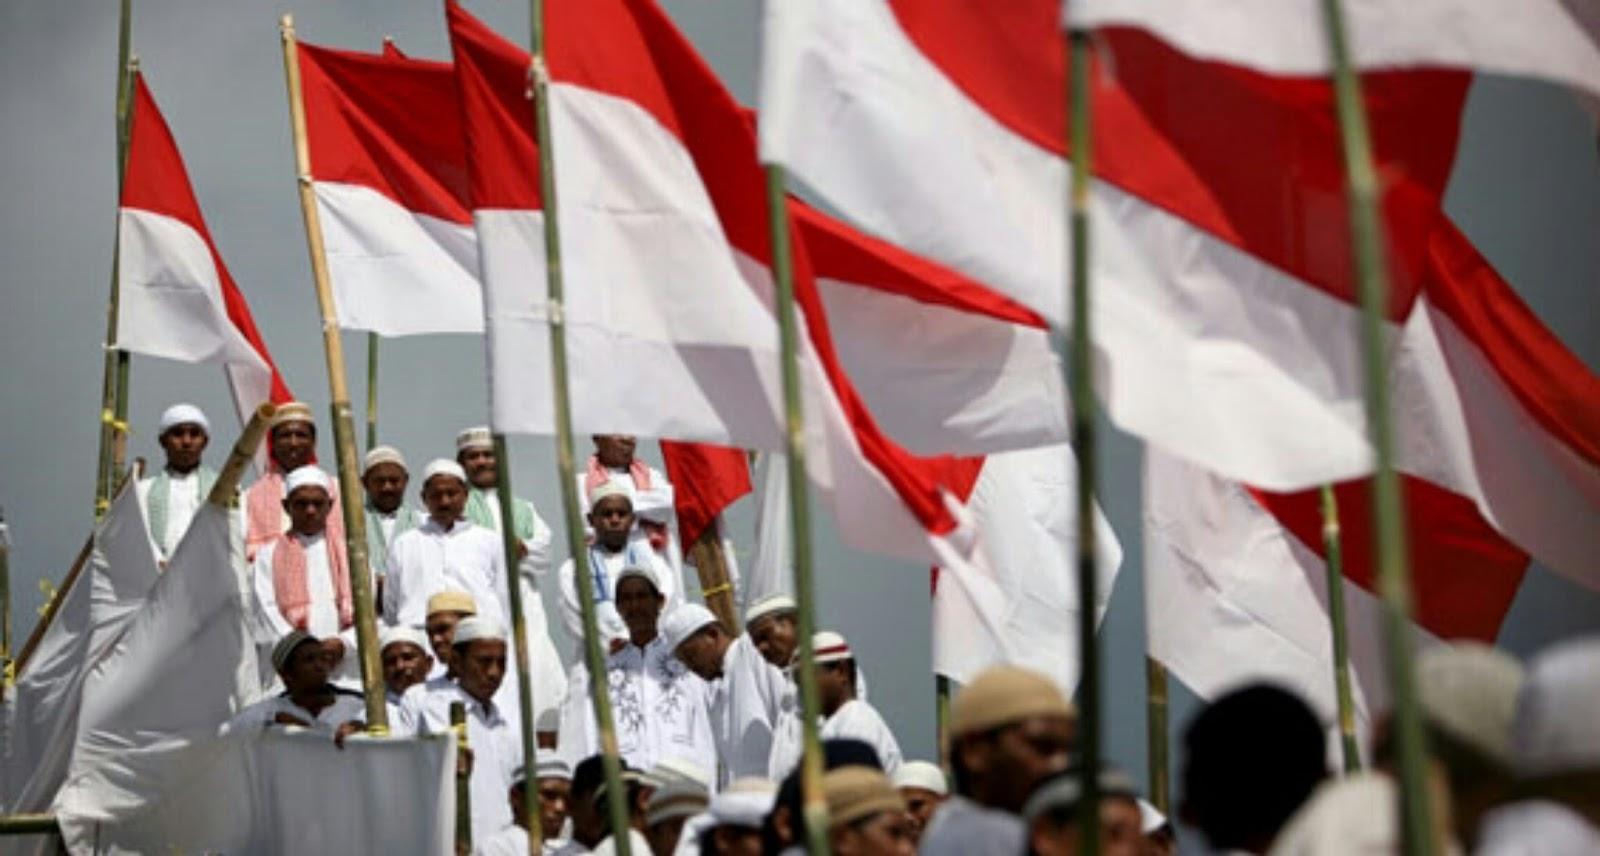 Islam Indonesia Islam Damai-IslamRamah.co